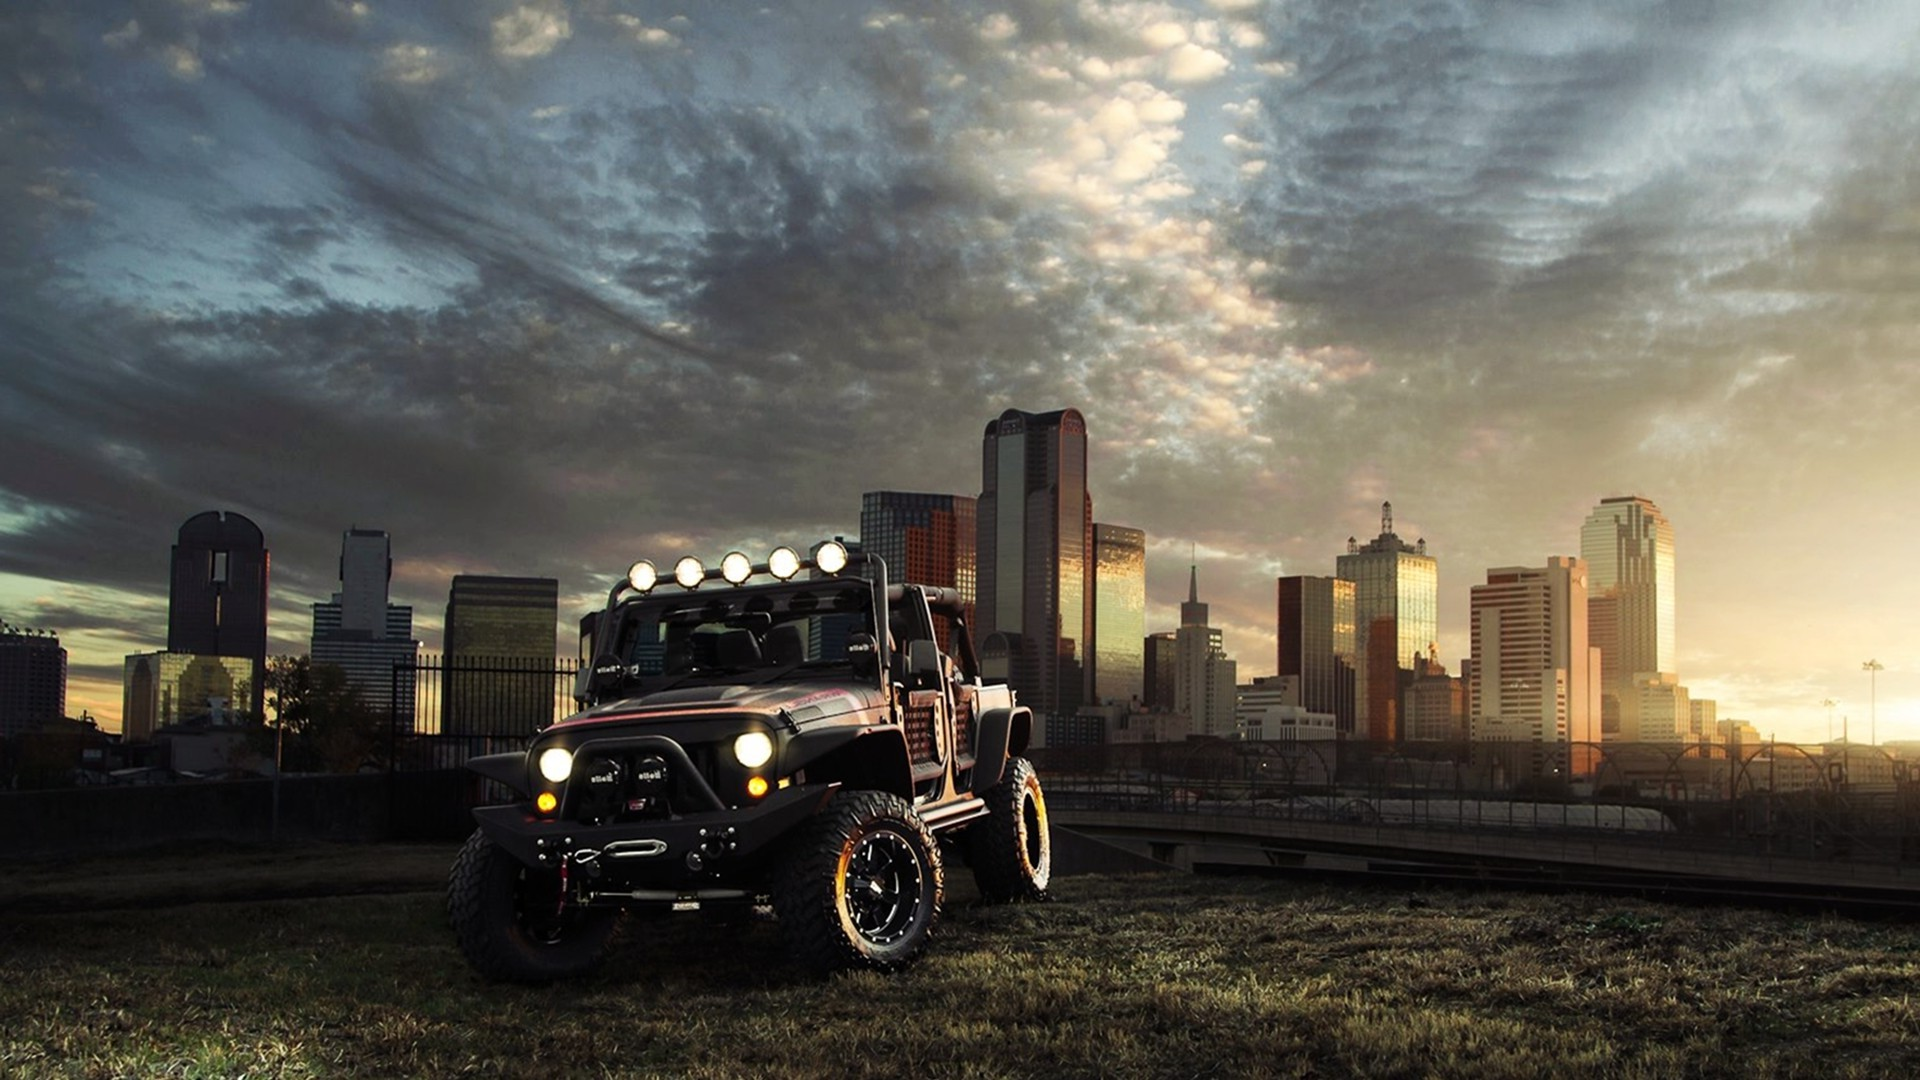 Mahindra And Mahindra Cars Wallpapers Jeep Wallpaper Hd Pixelstalk Net